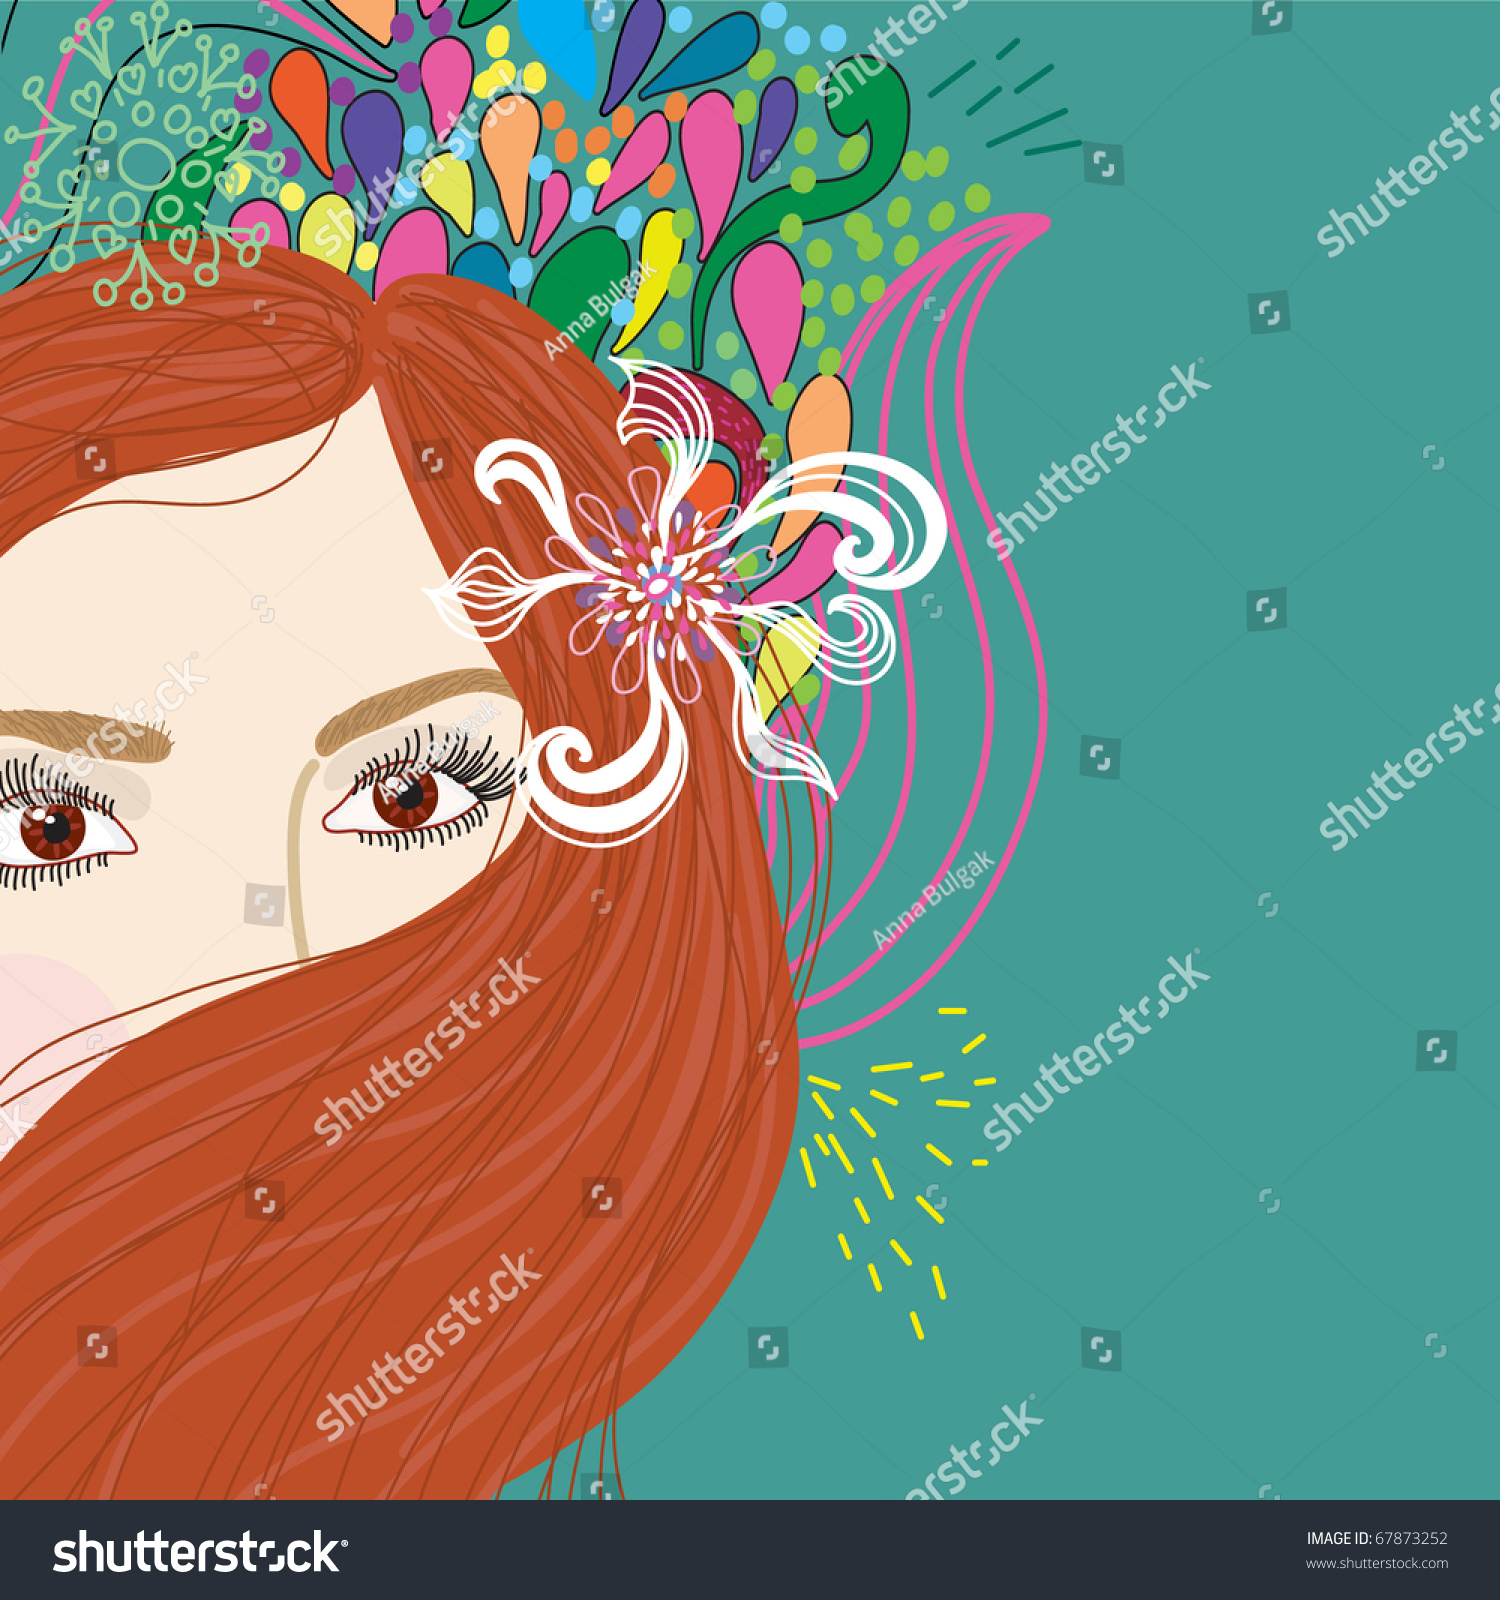 Beautiful woman cartoon flowers background stock vector royalty beautiful woman with cartoon flowers background izmirmasajfo